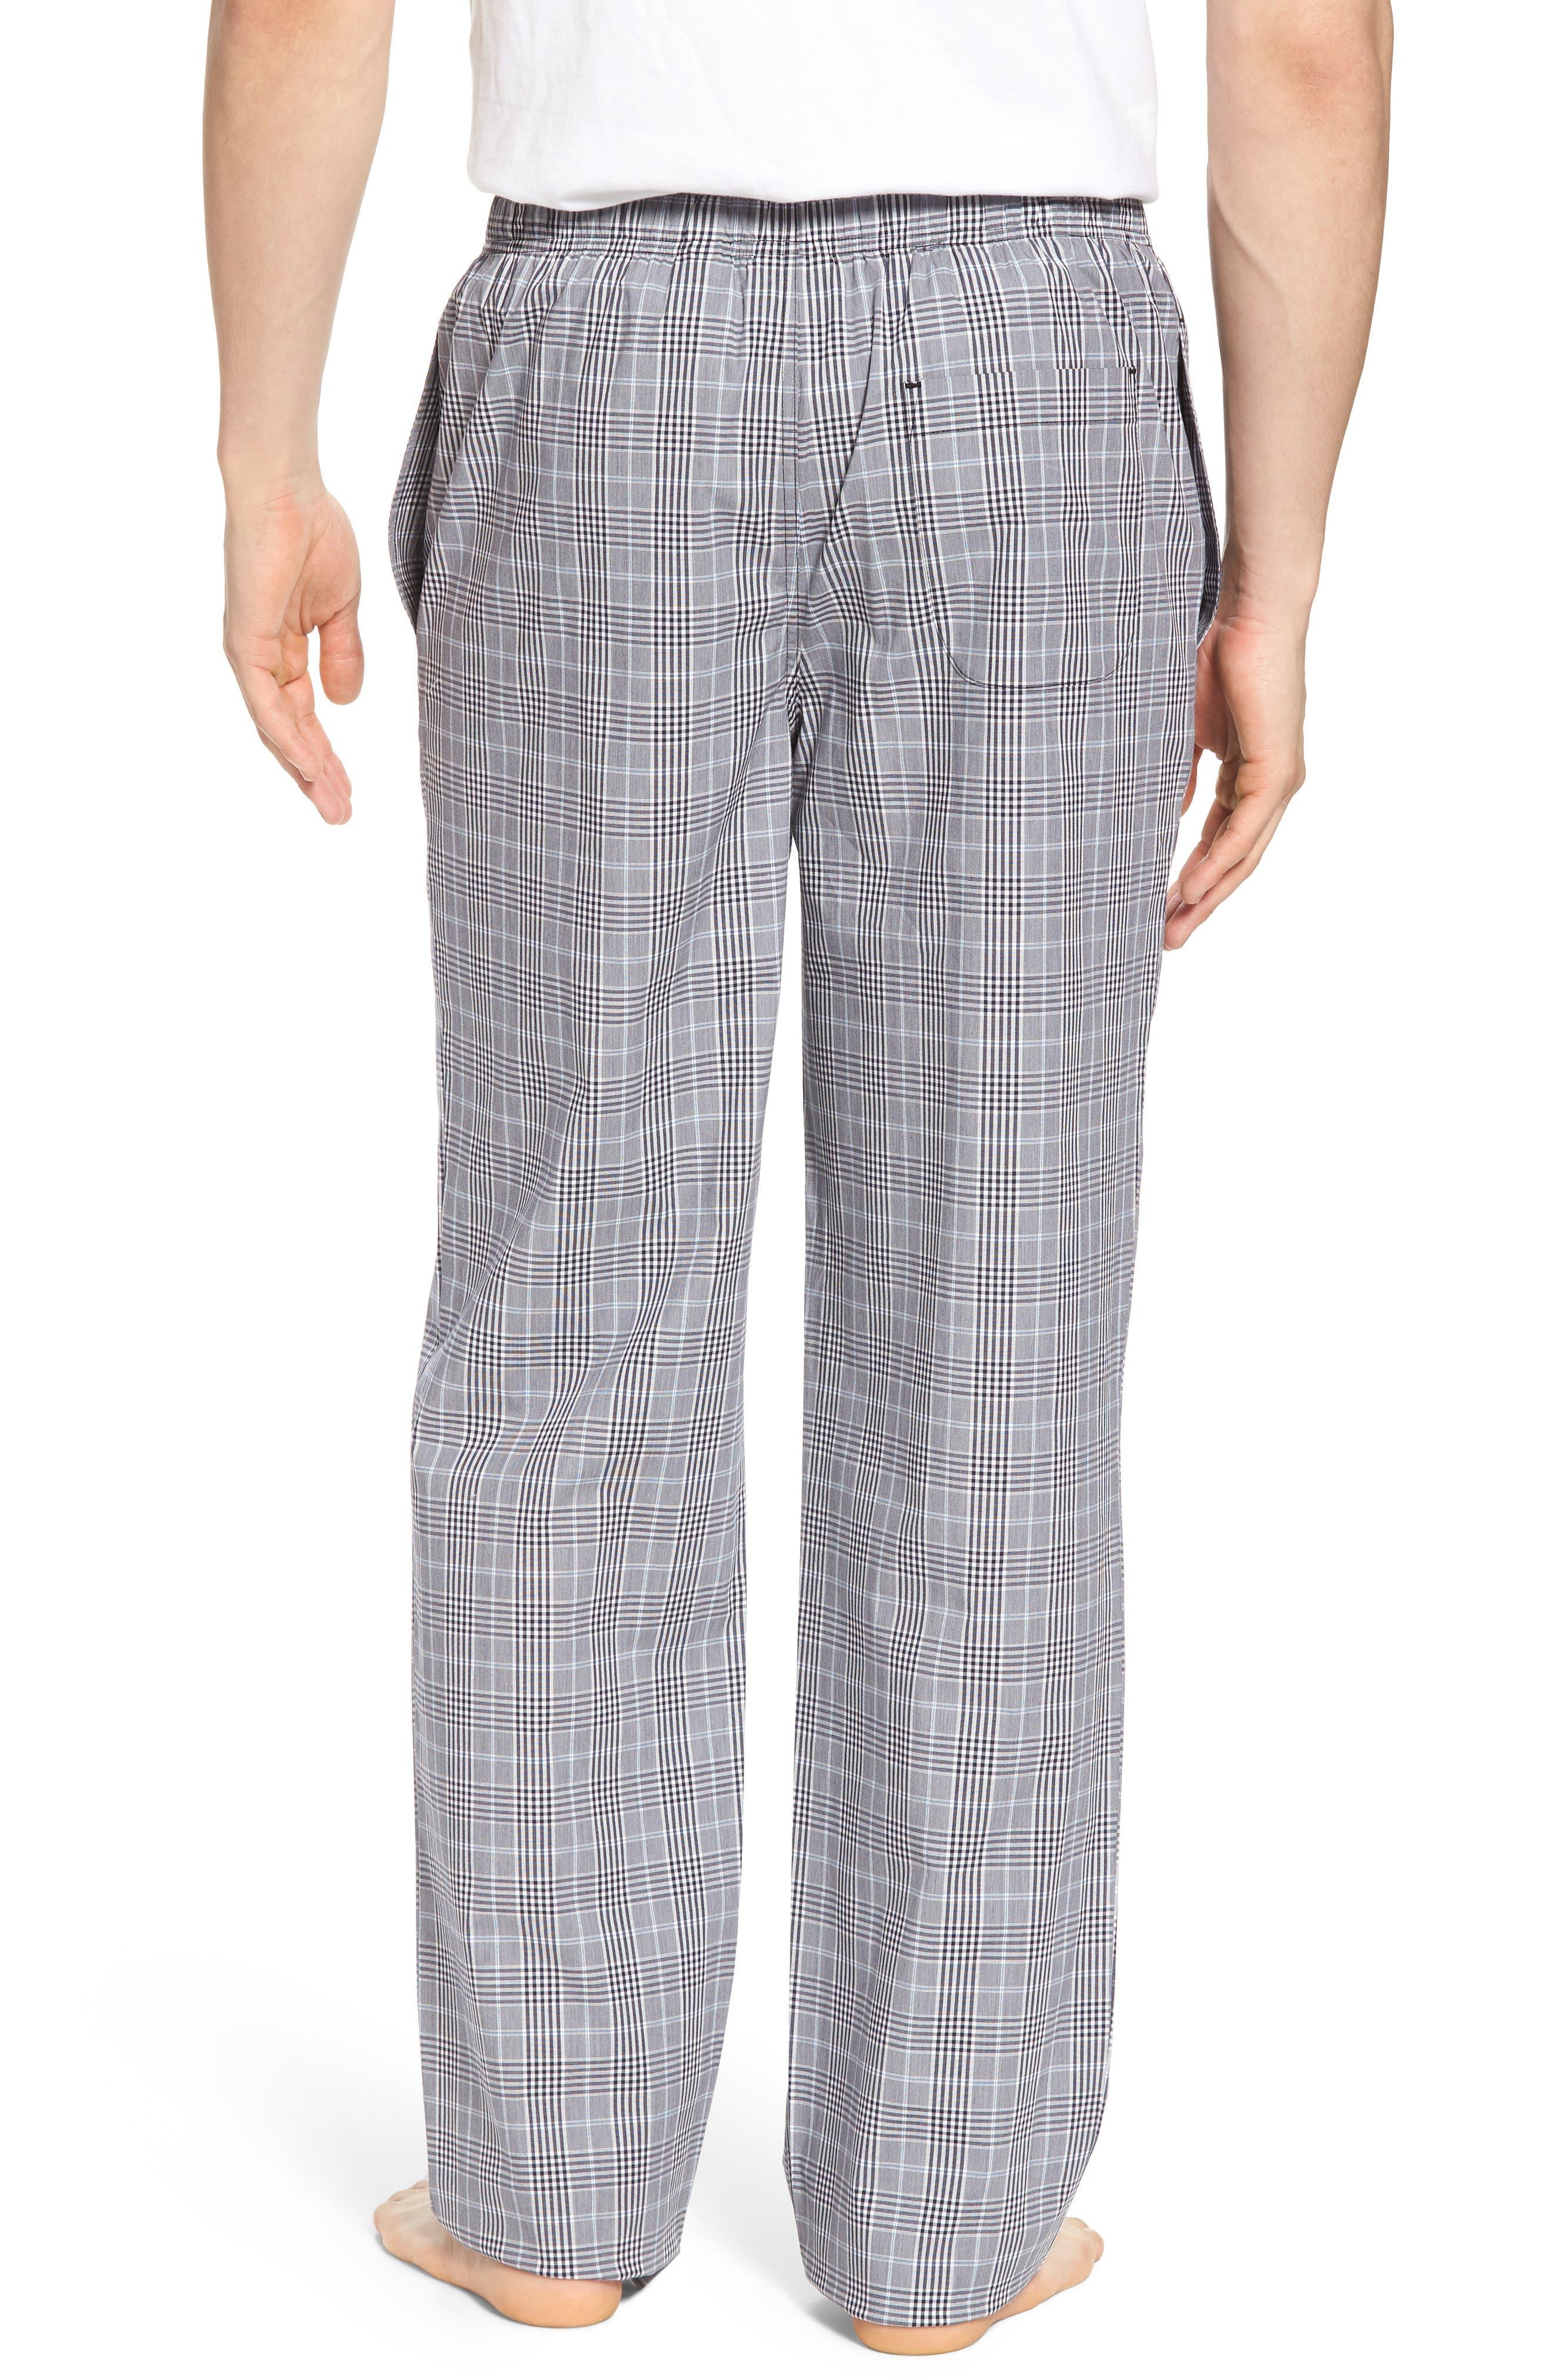 MAJESTIC INTERNATIONAL, Charleston Lounge Pants, Alternate thumbnail 2, color, BLACK PLAID